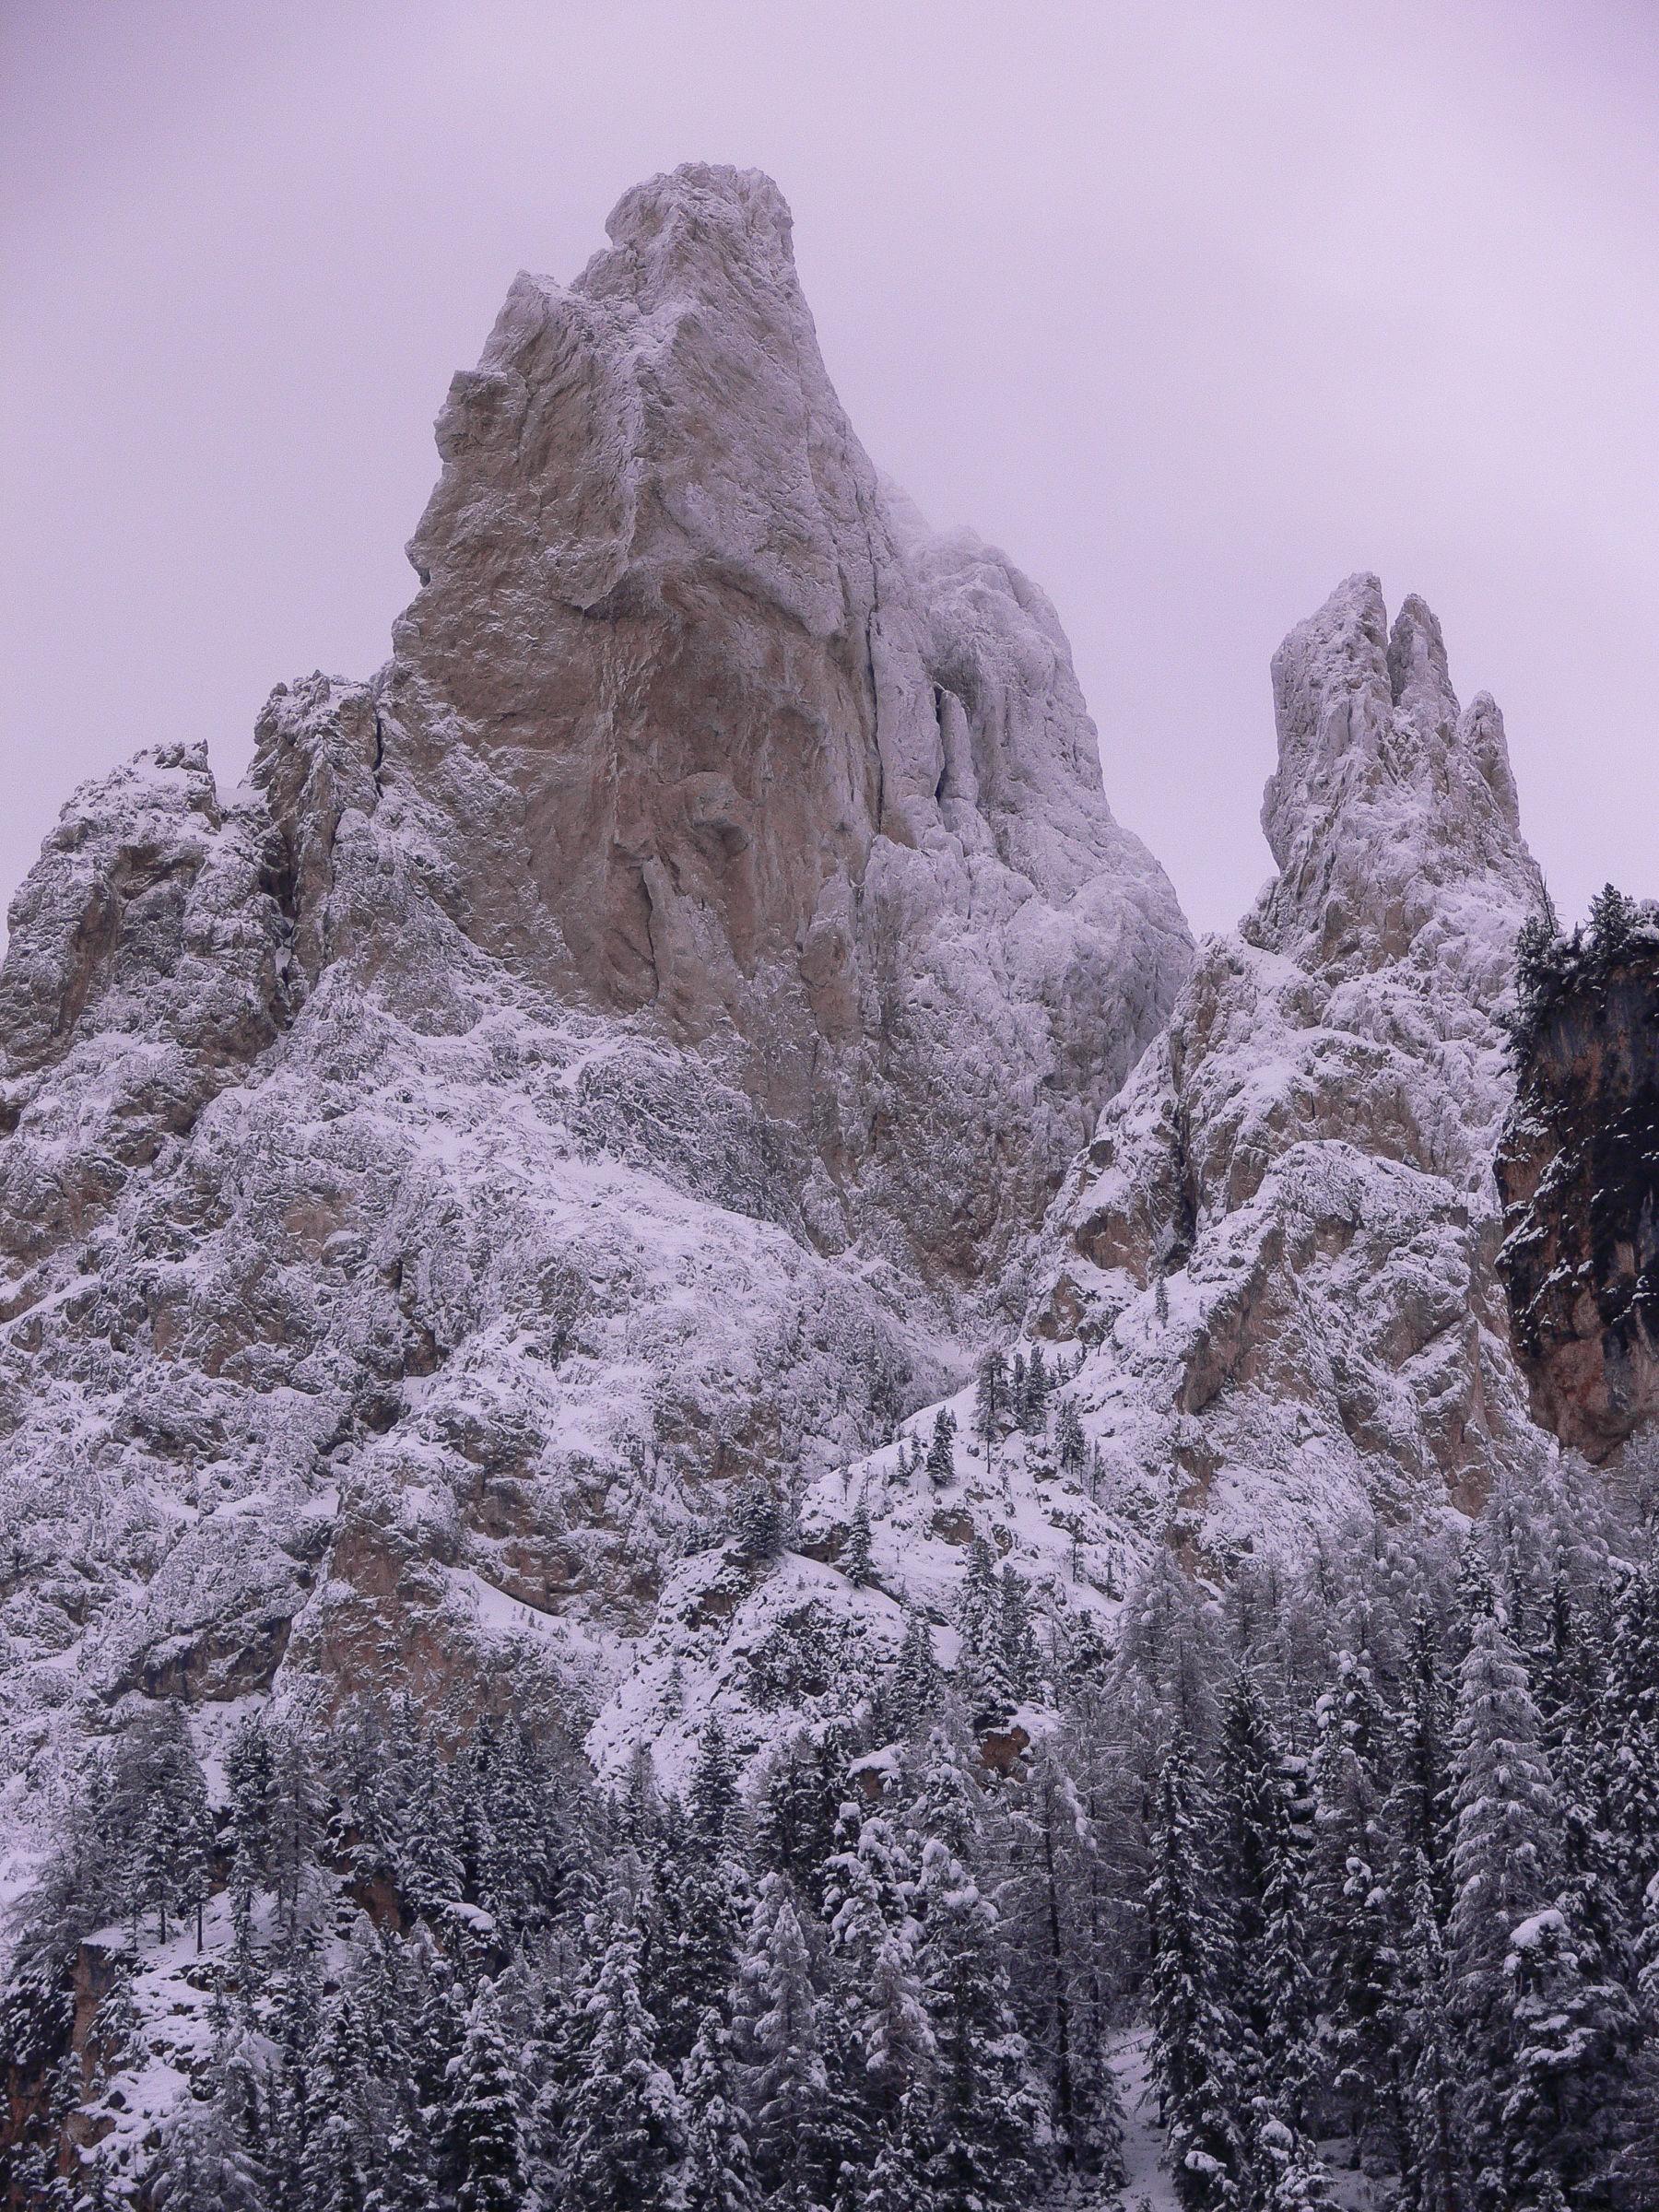 Whitewashed towers...